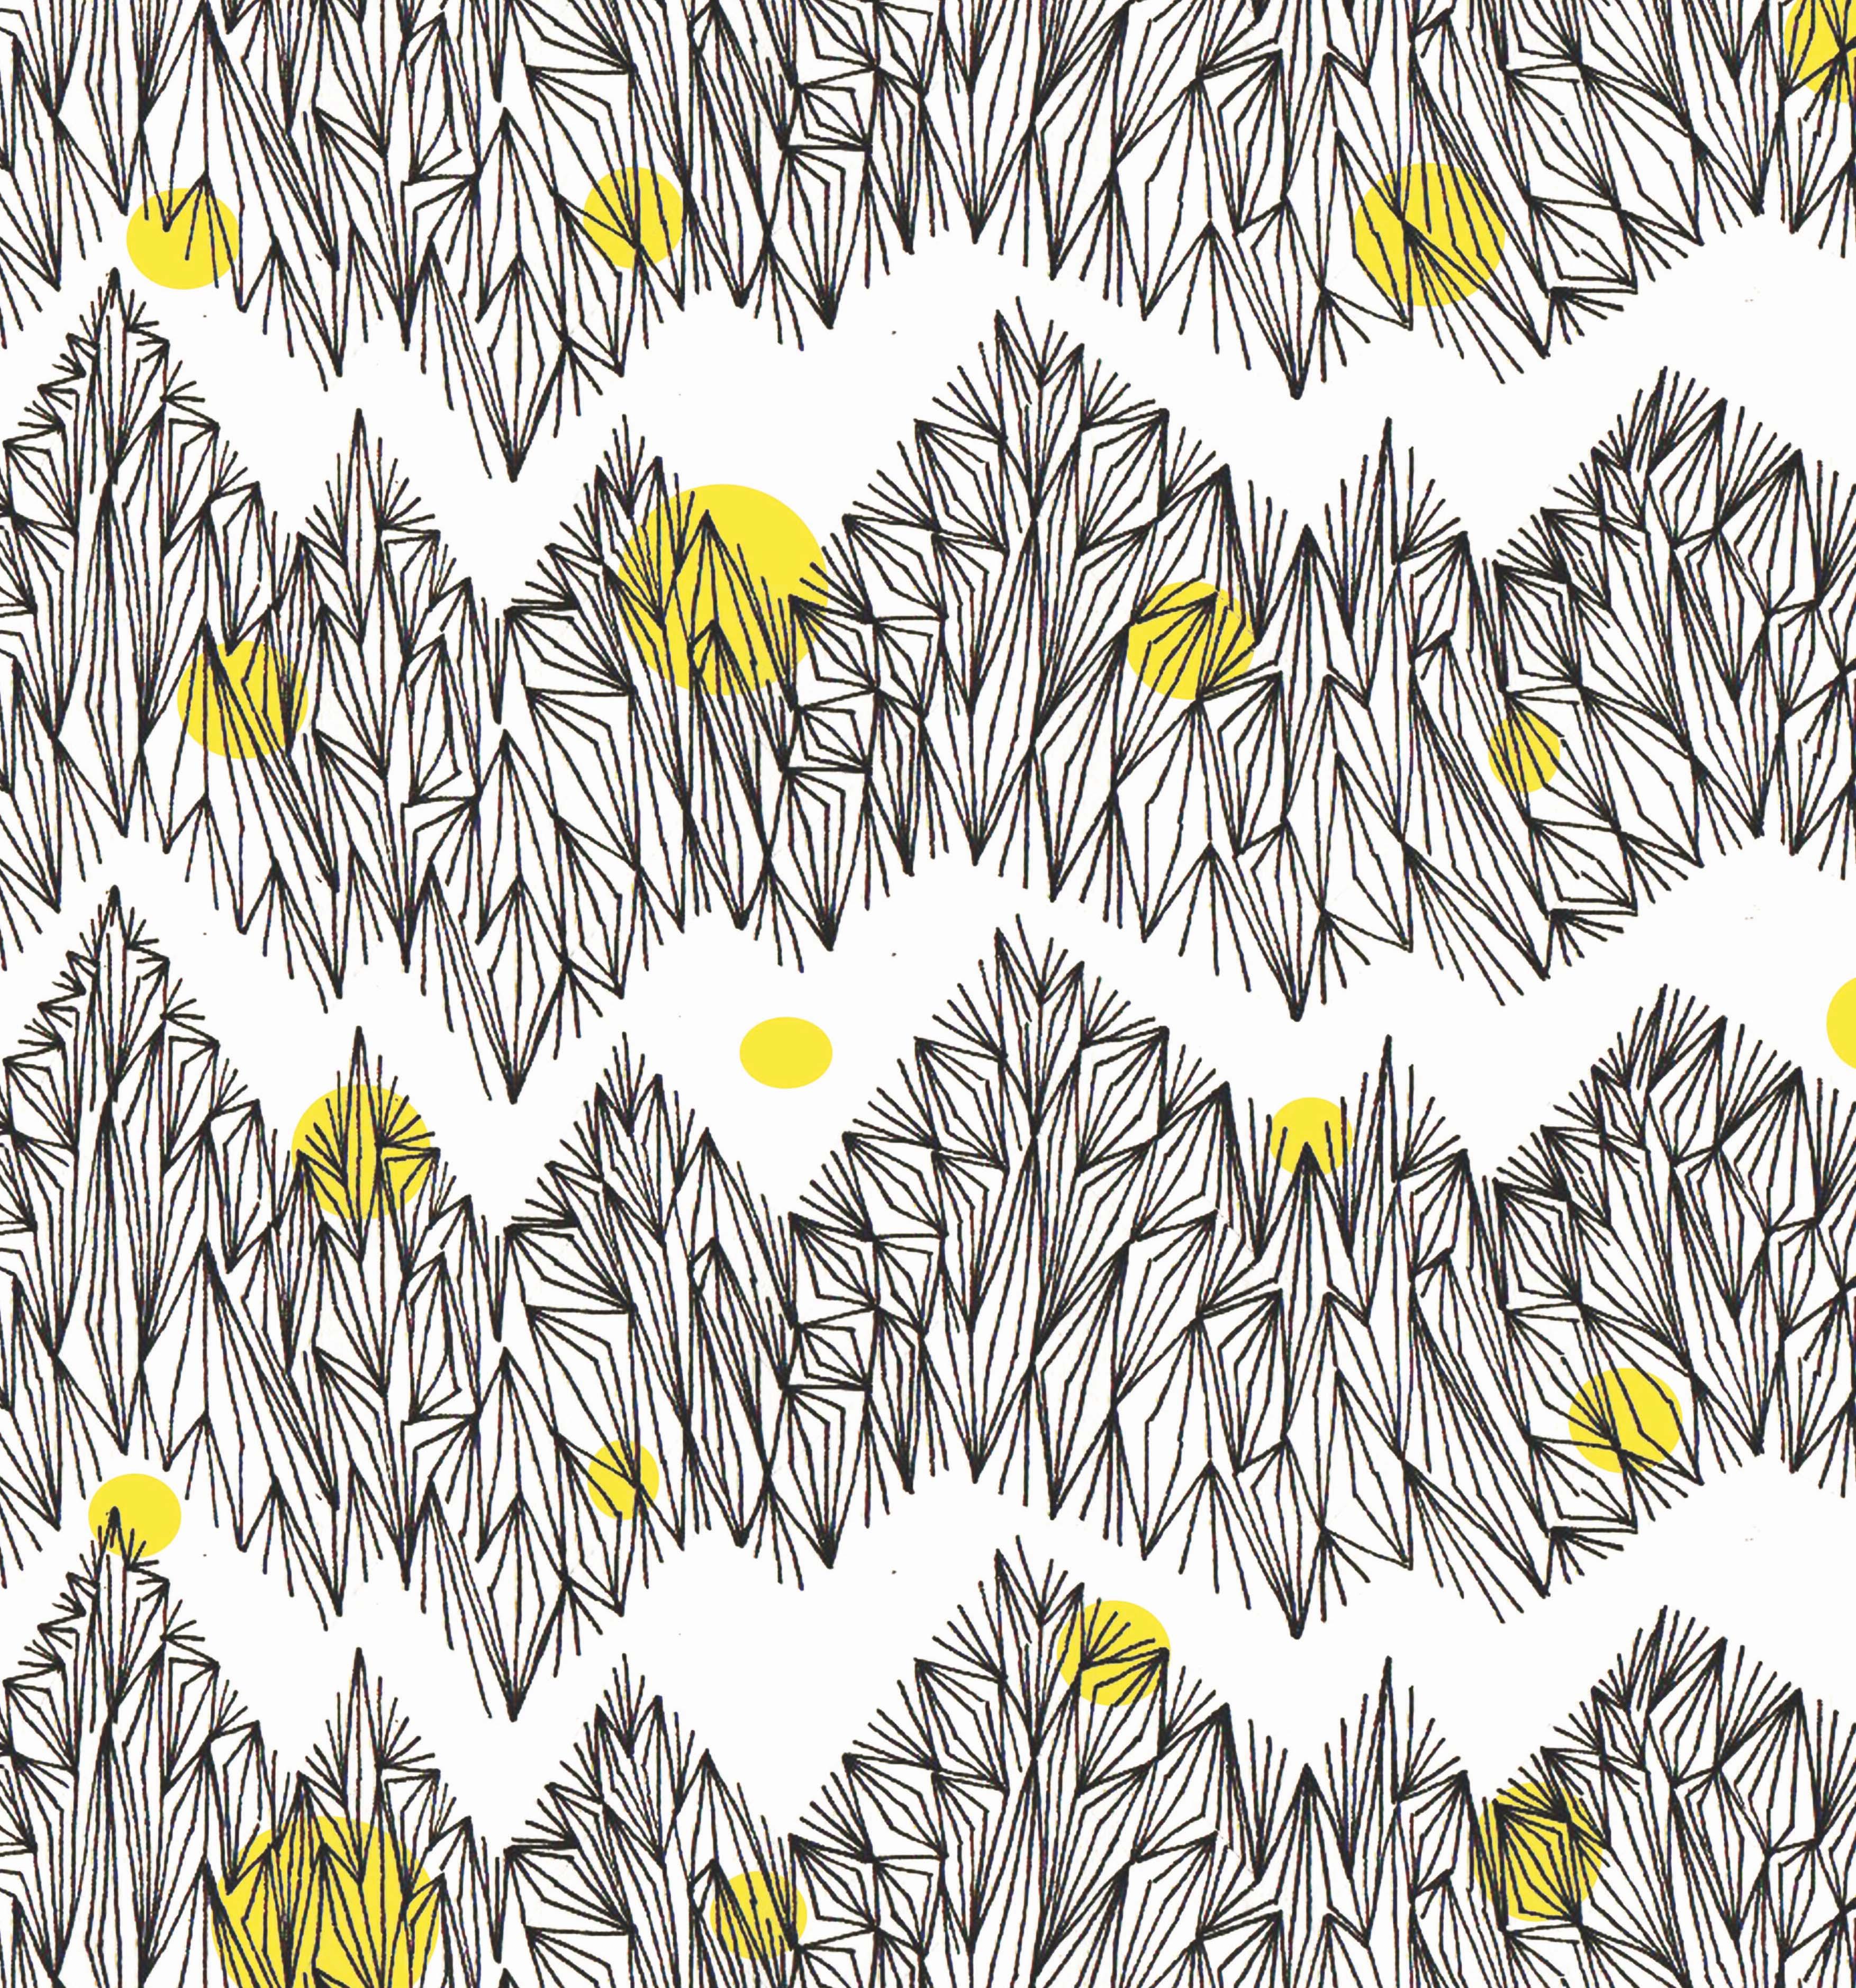 yellowstripe copie